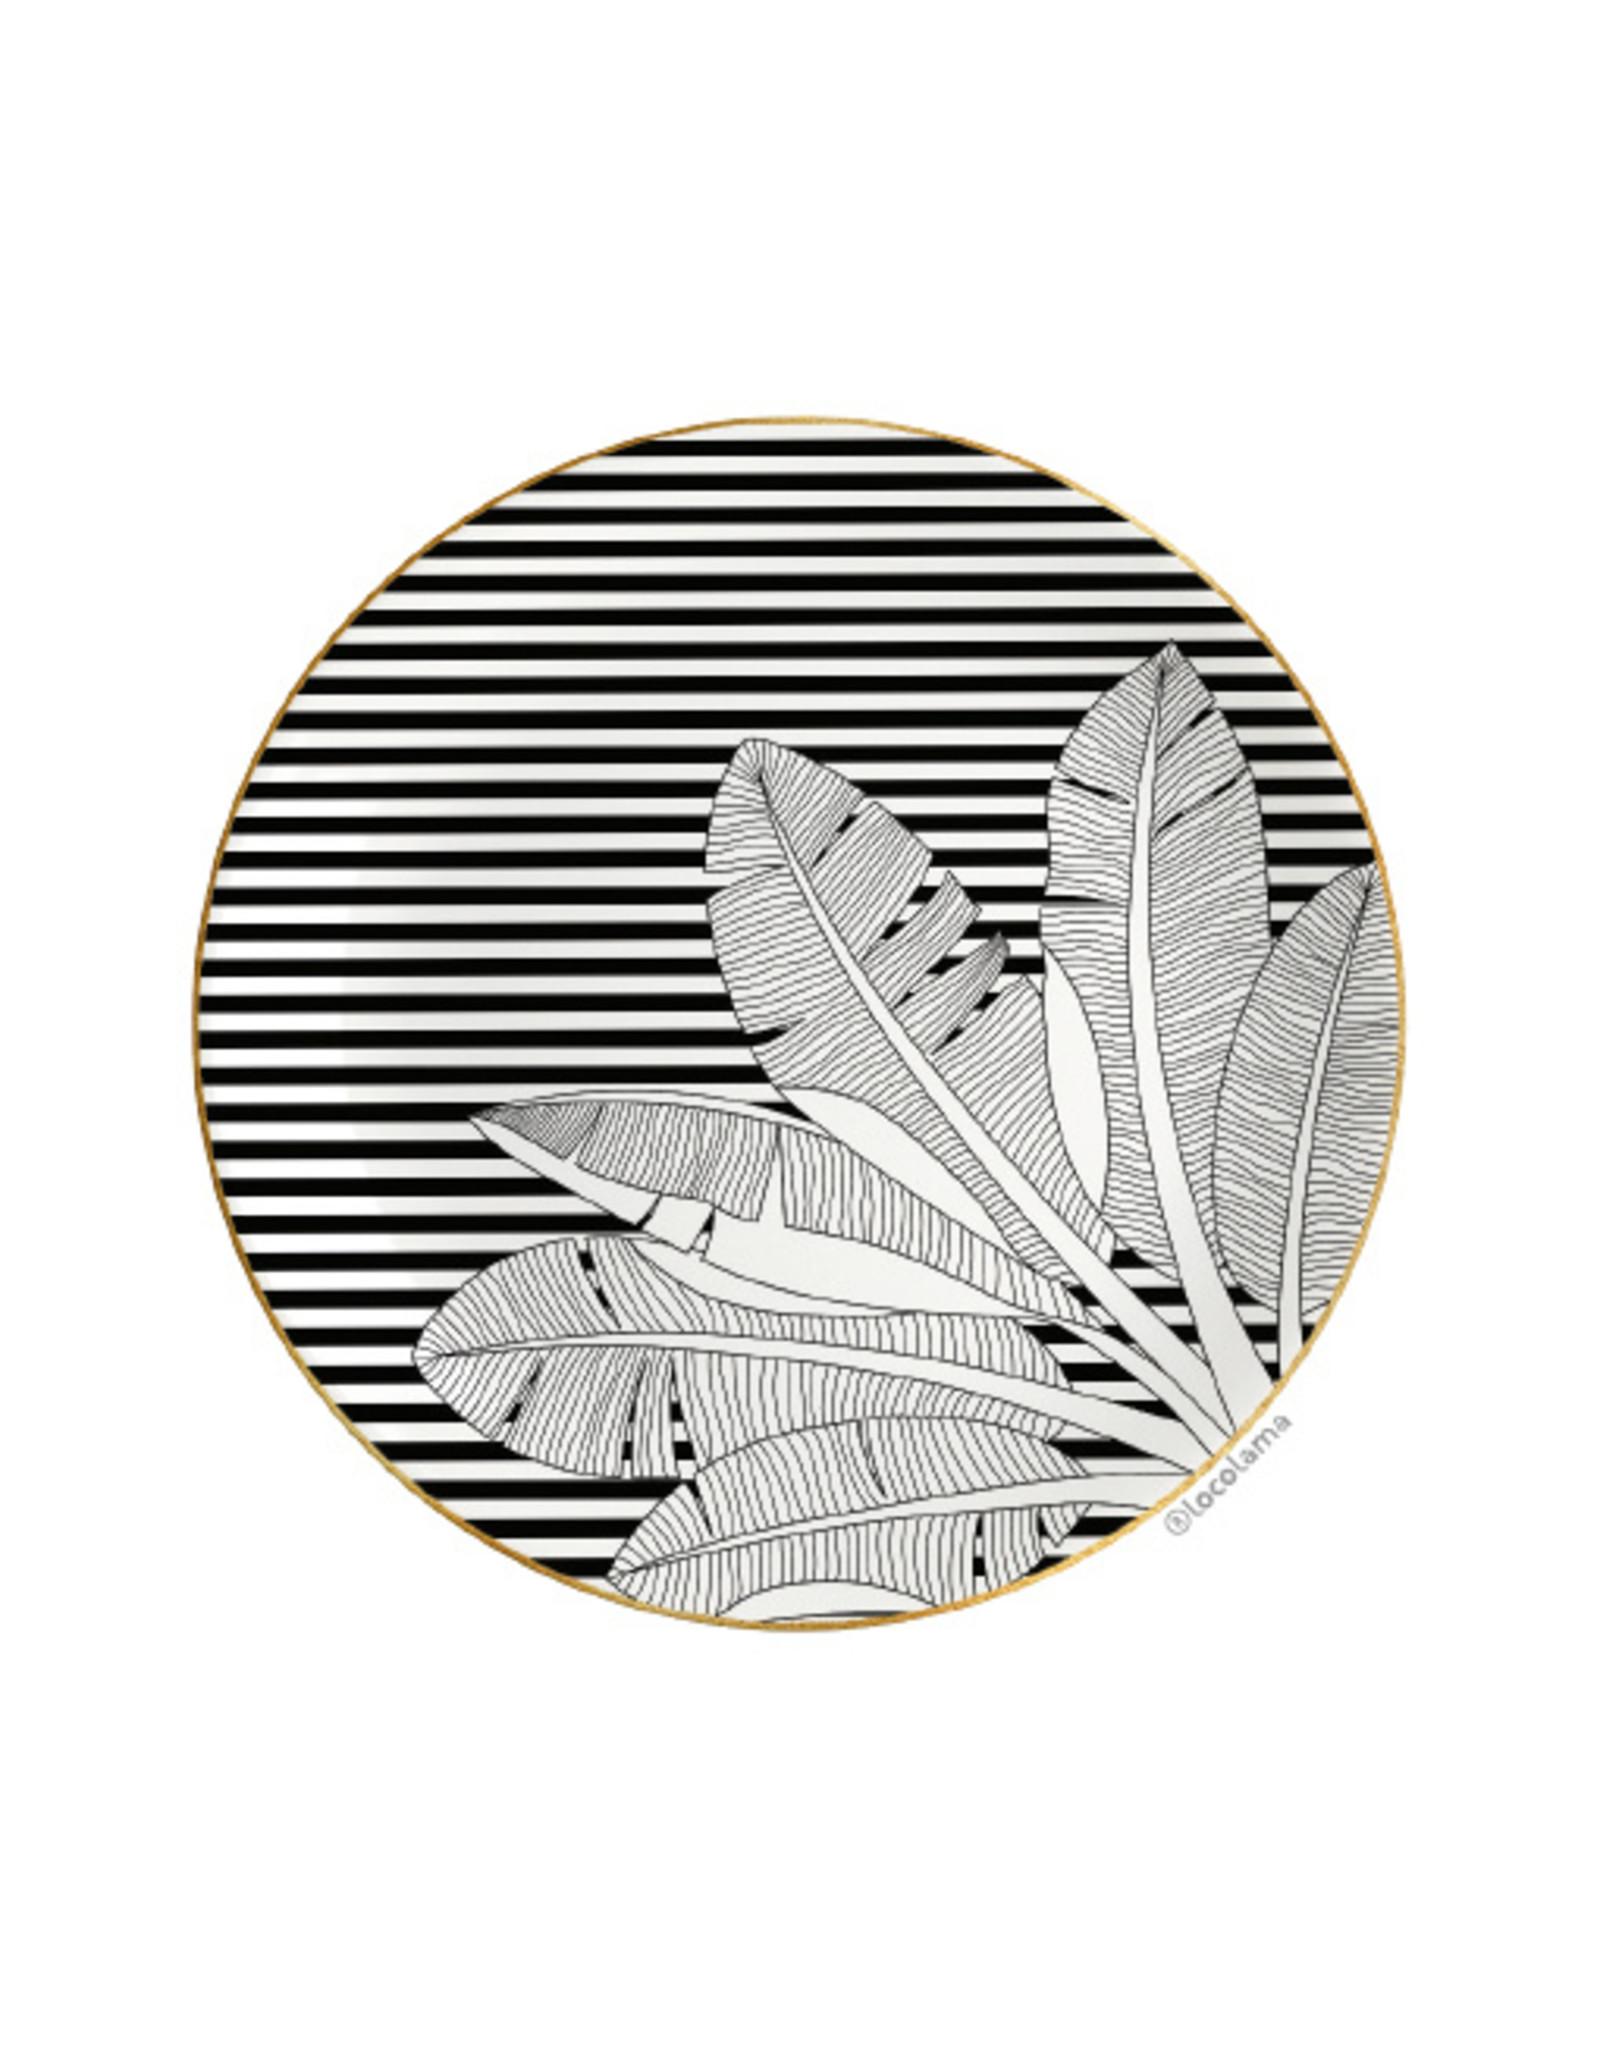 Loco Lama Decorative Wall Plate Palm Black & White Stripes